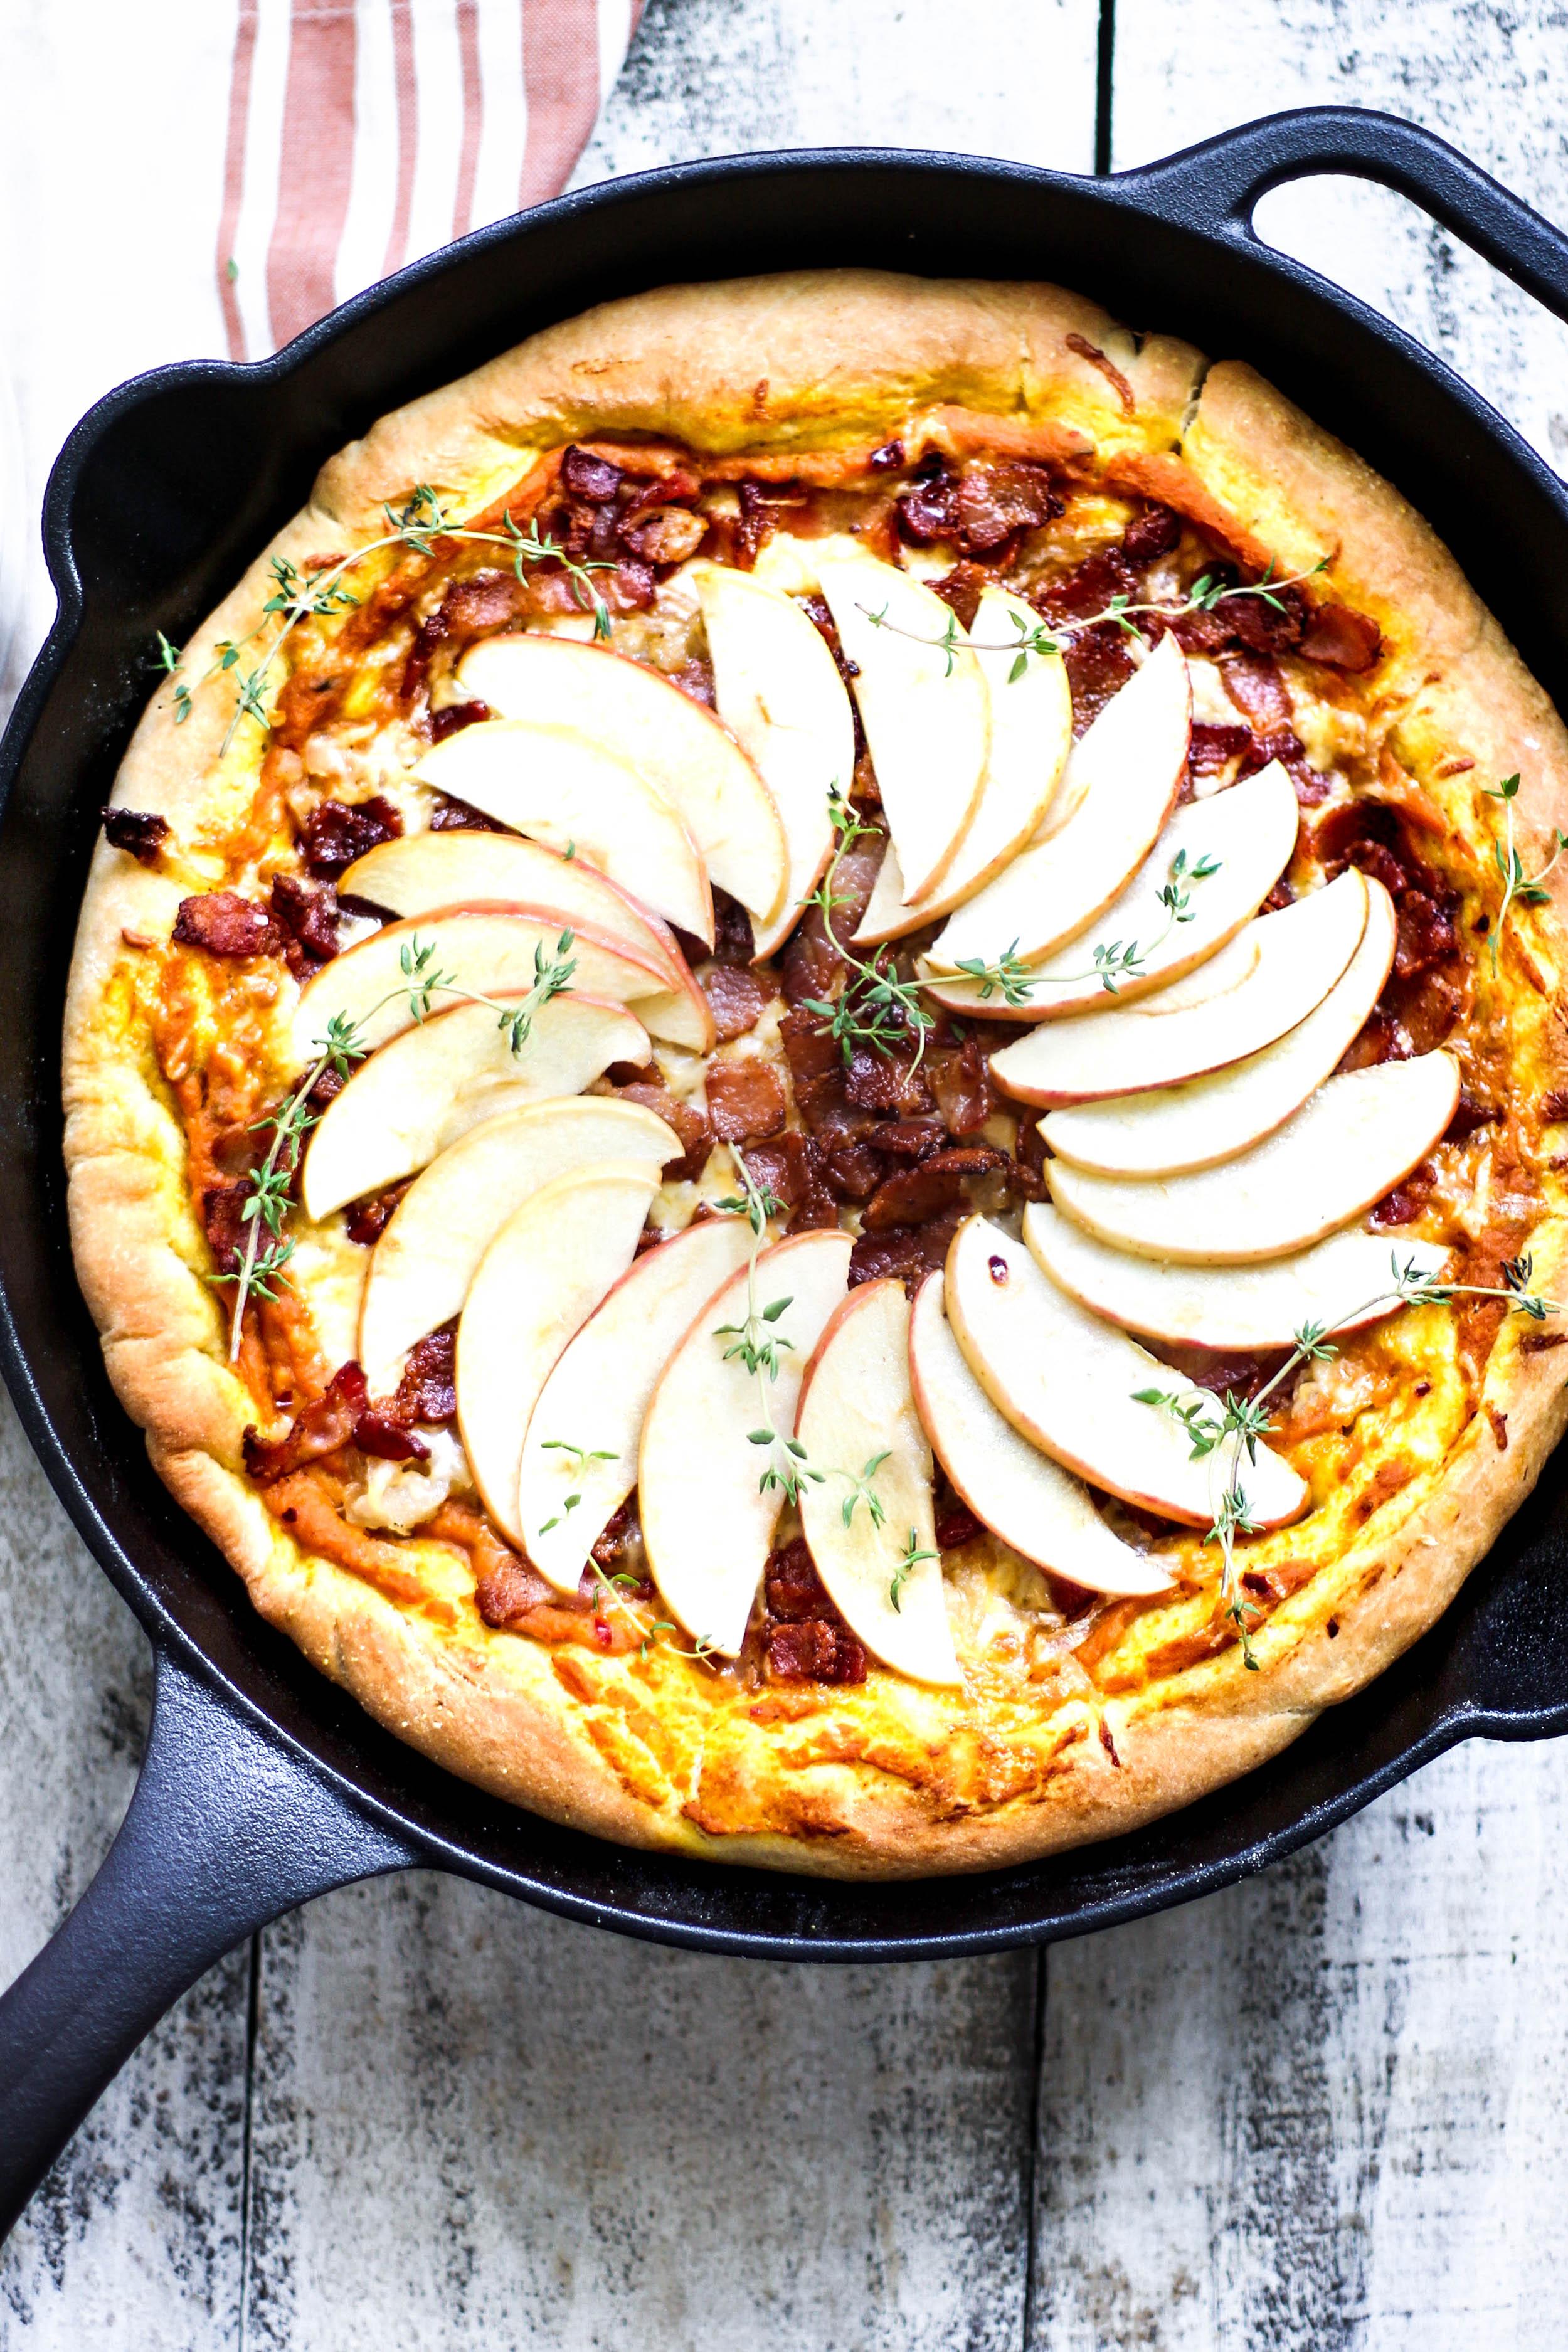 Apple, Bacon, and Pumpkin Pan Pizza